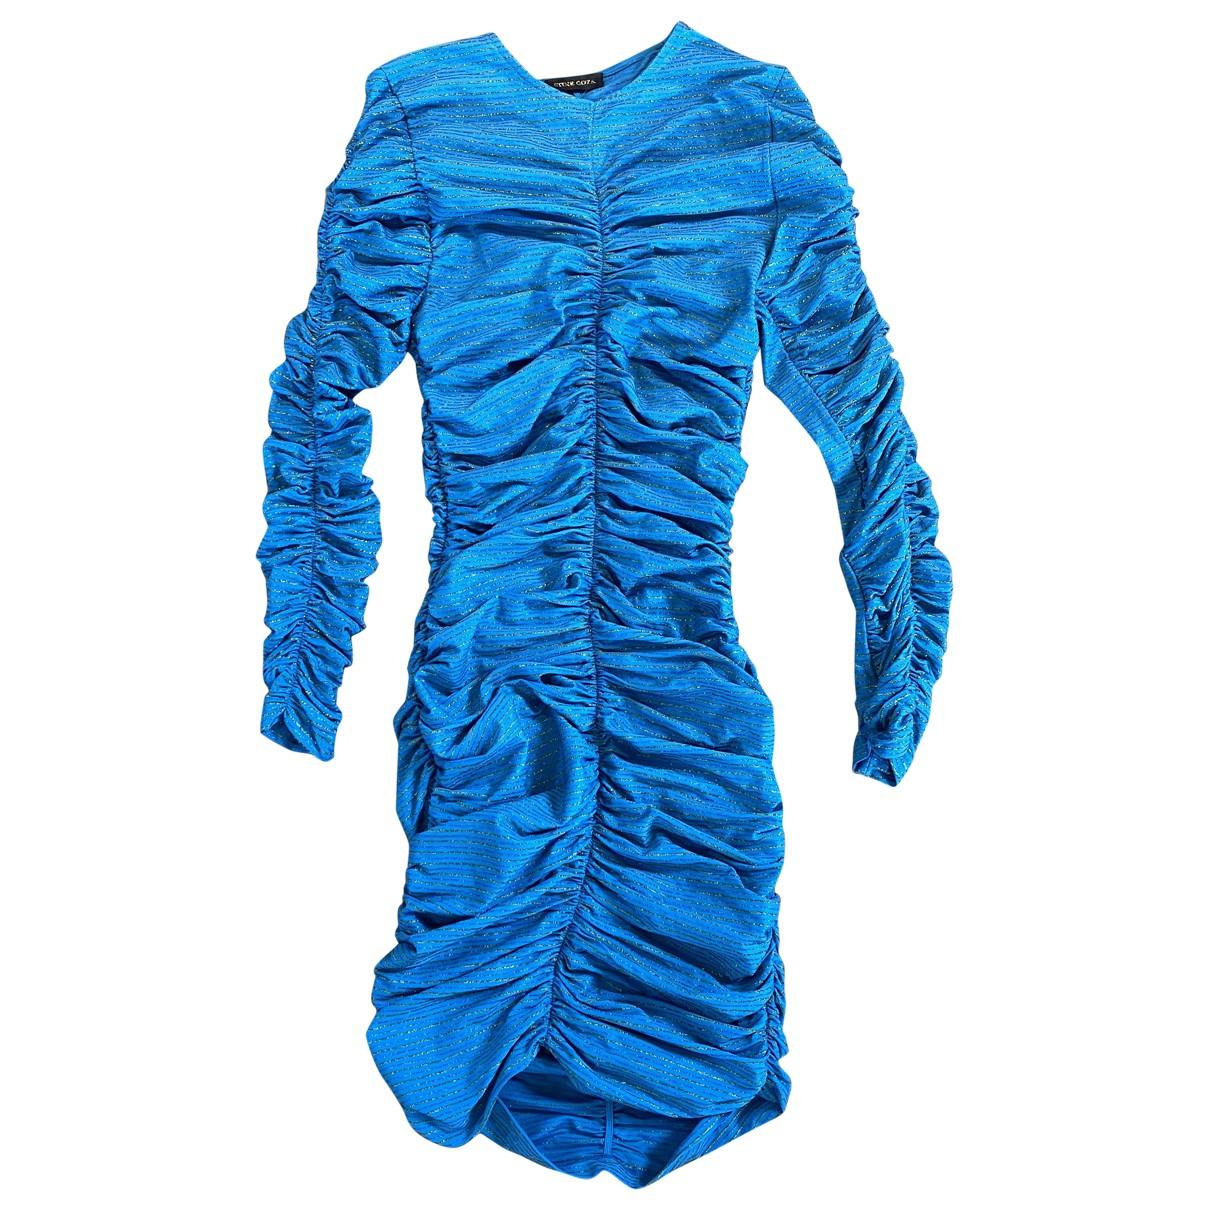 Stine Goya \N Turquoise dress for Women S International